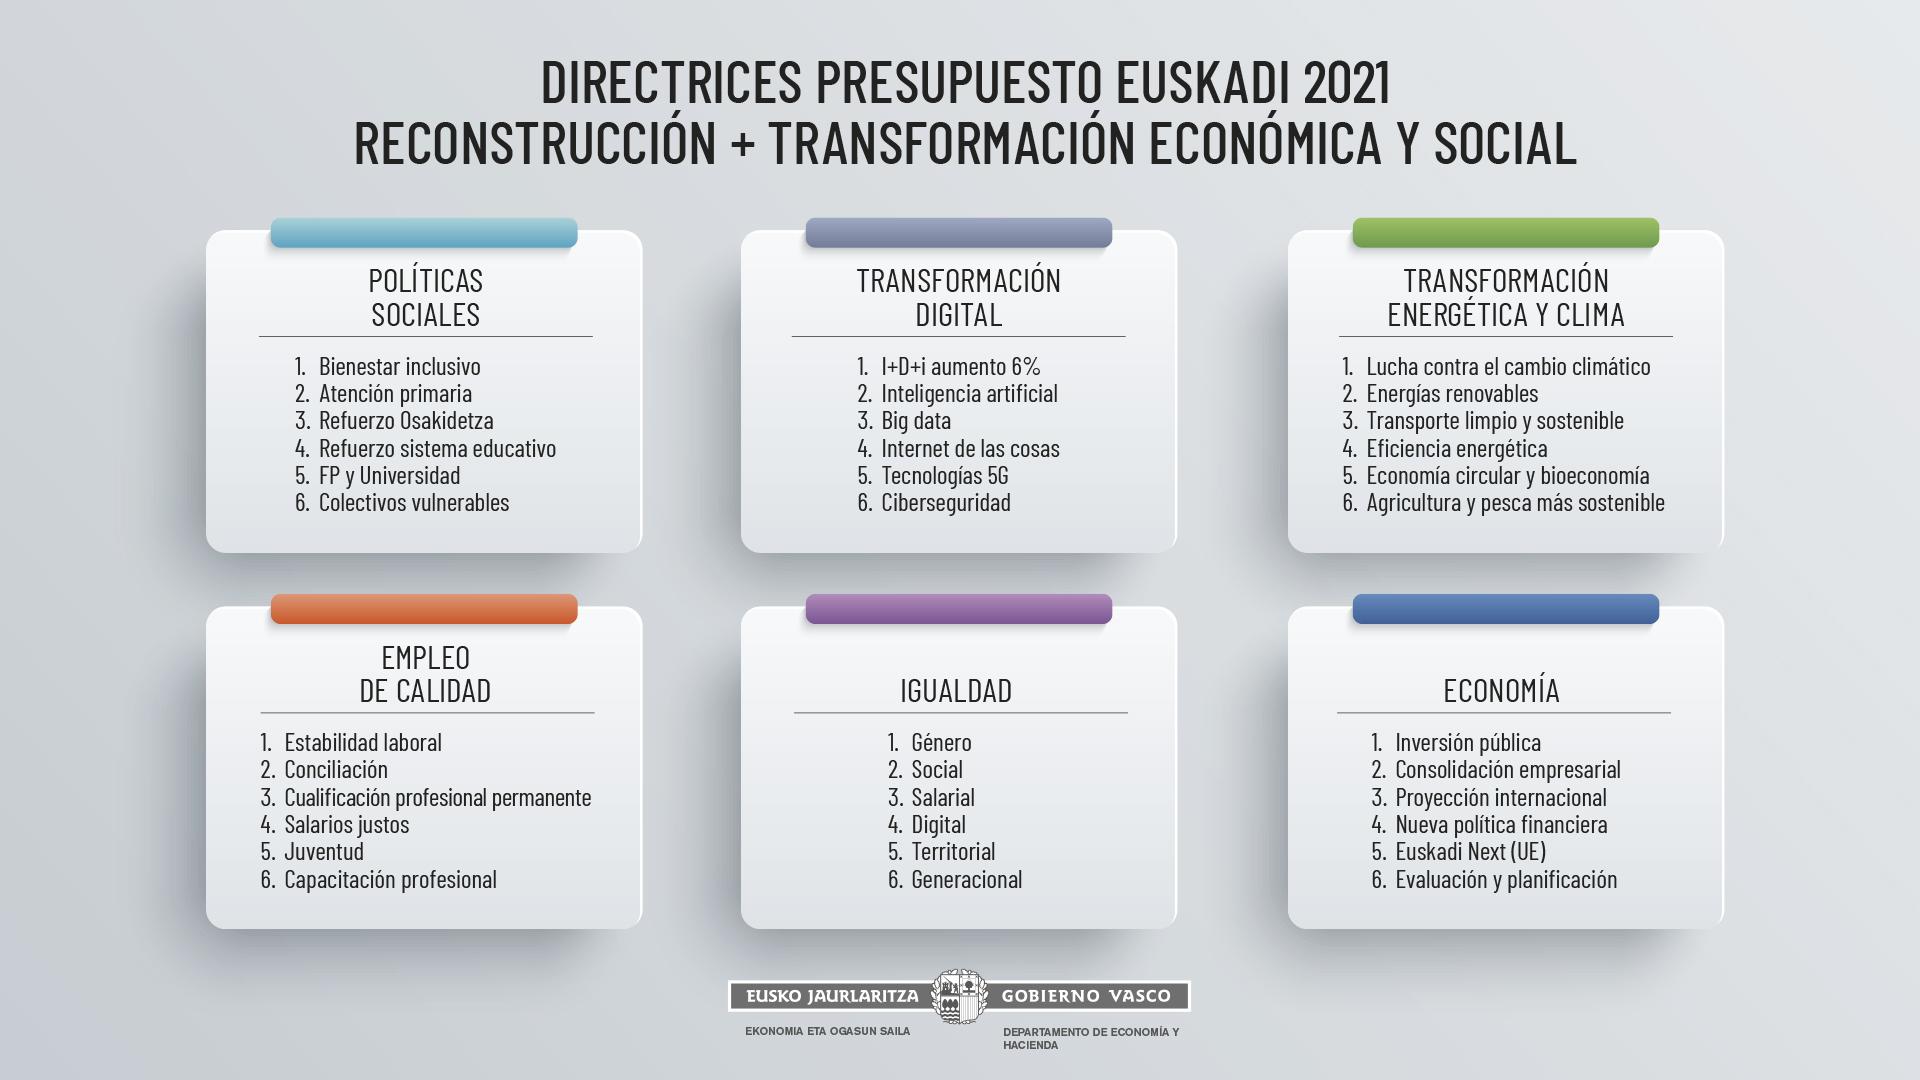 Directrices_Presu2021_CAS_1920x1080.jpg